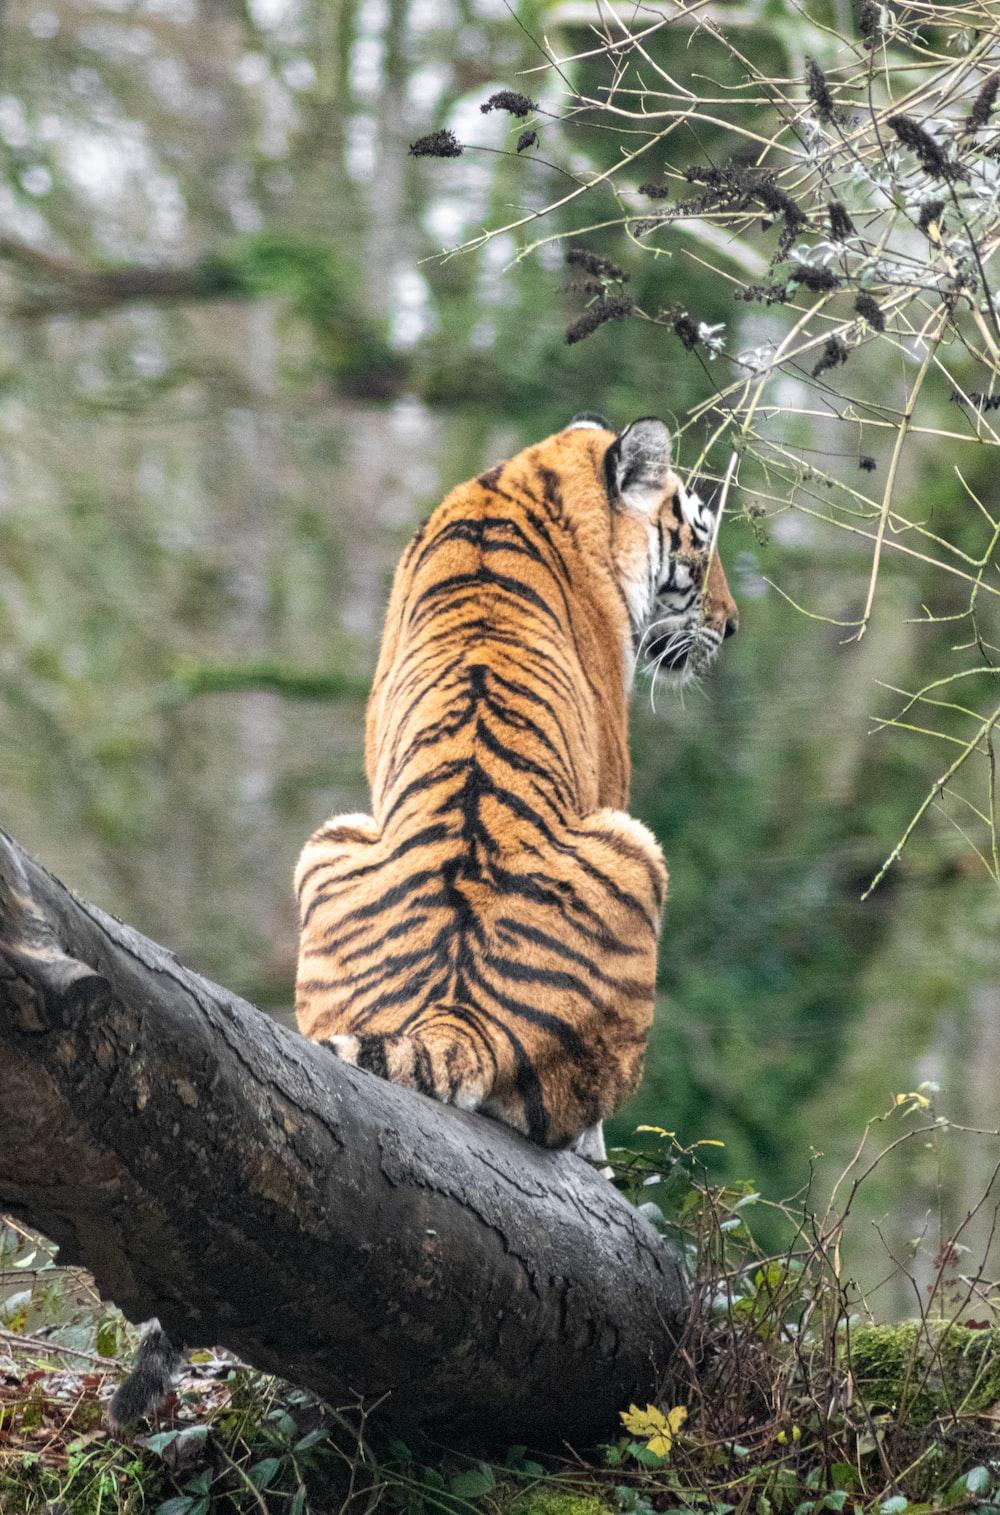 tiger lying on tree branch during daytime